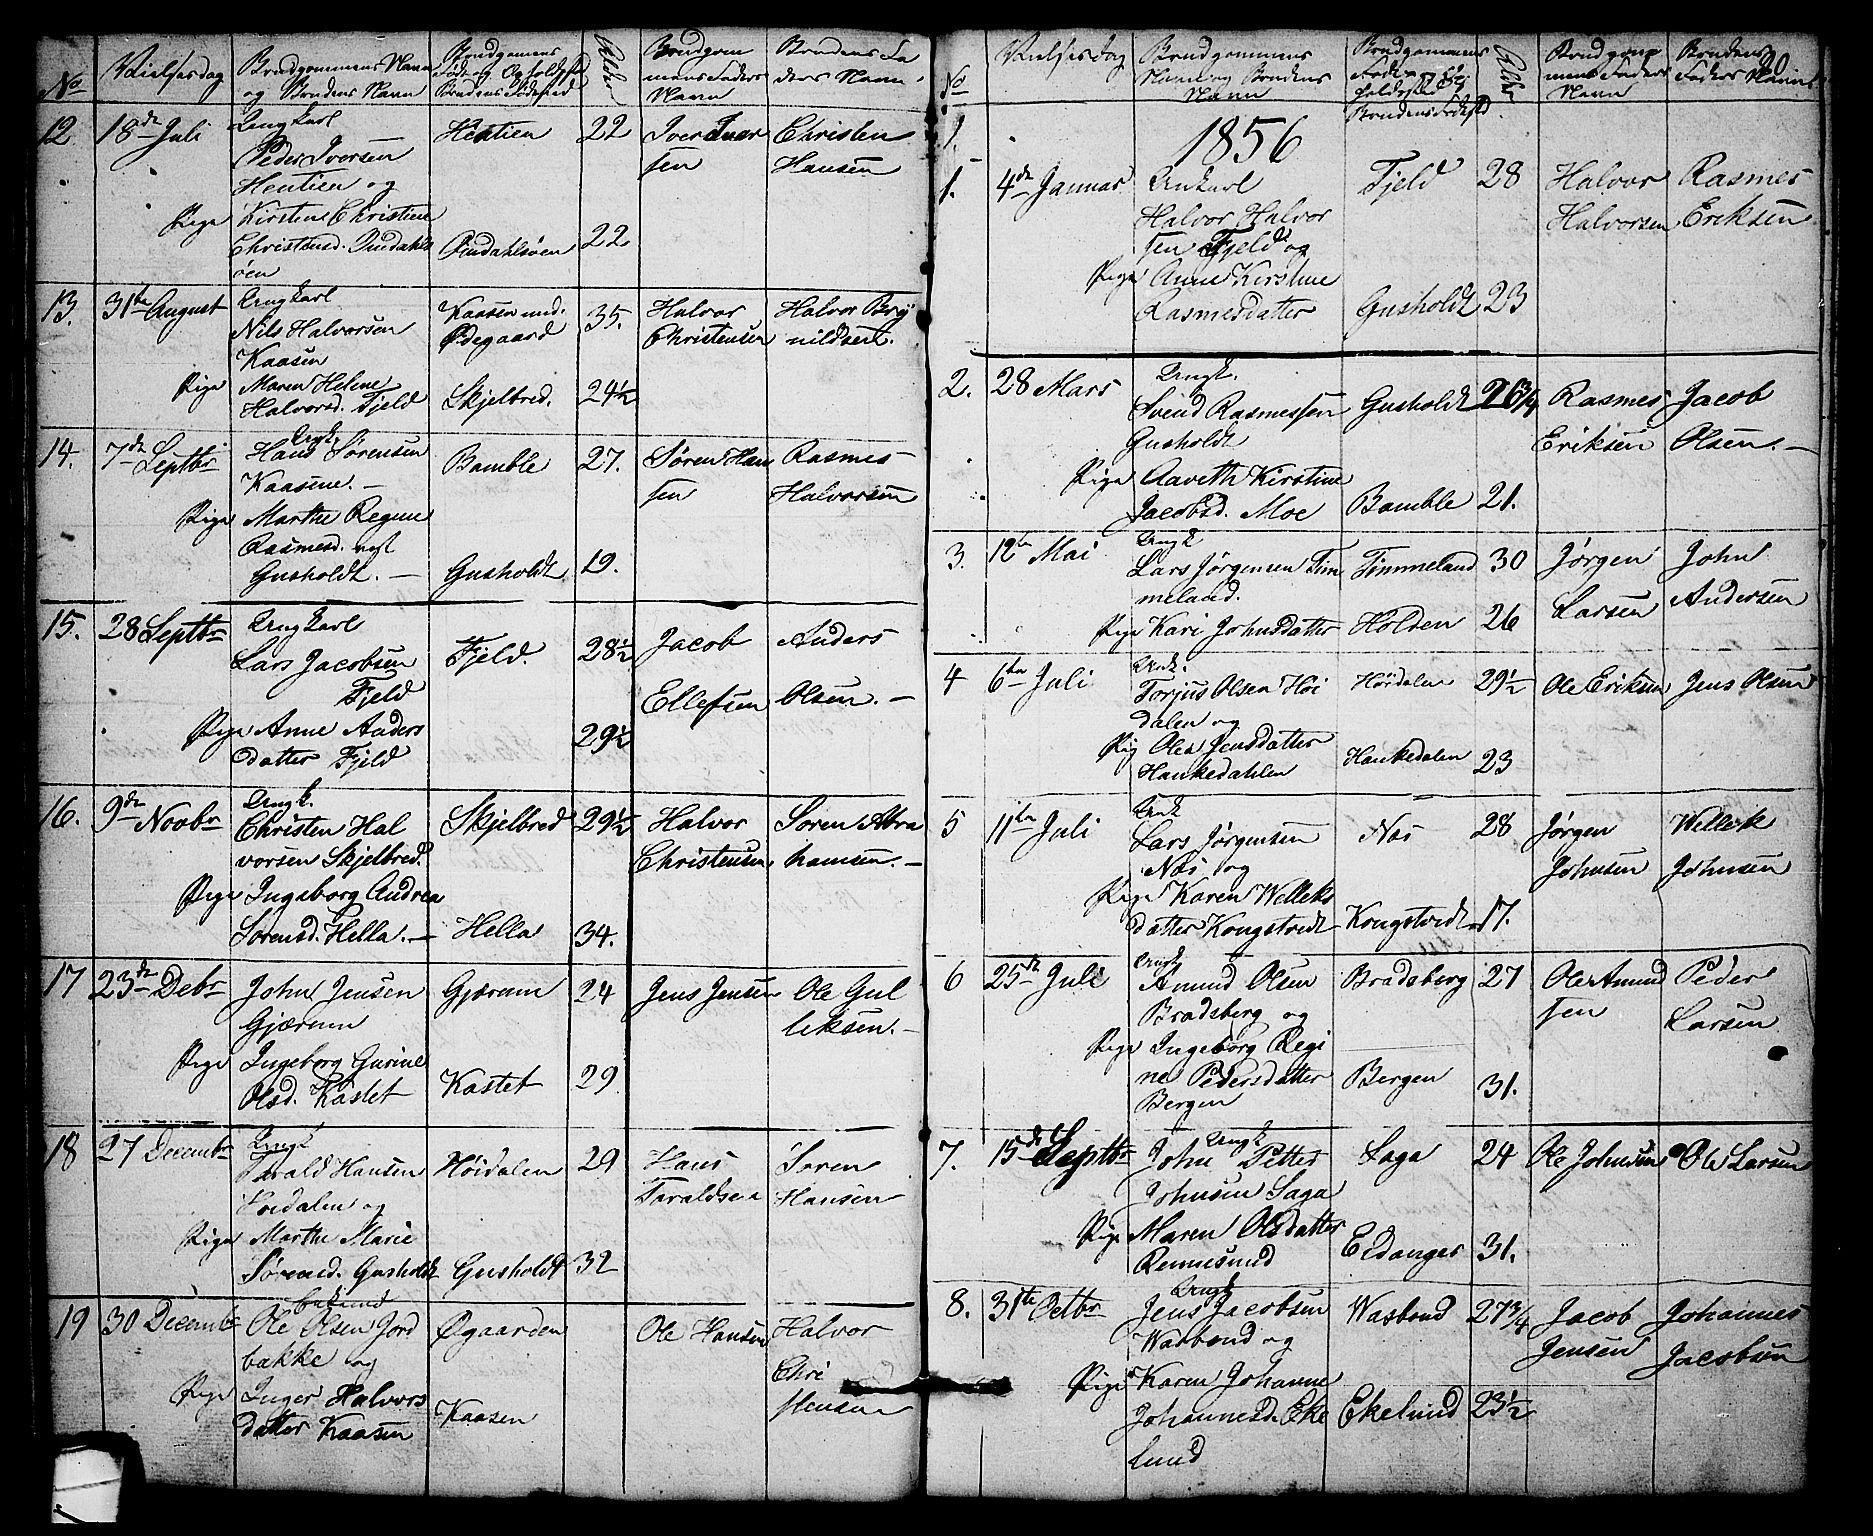 SAKO, Solum kirkebøker, G/Gb/L0001: Klokkerbok nr. II 1, 1848-1859, s. 90